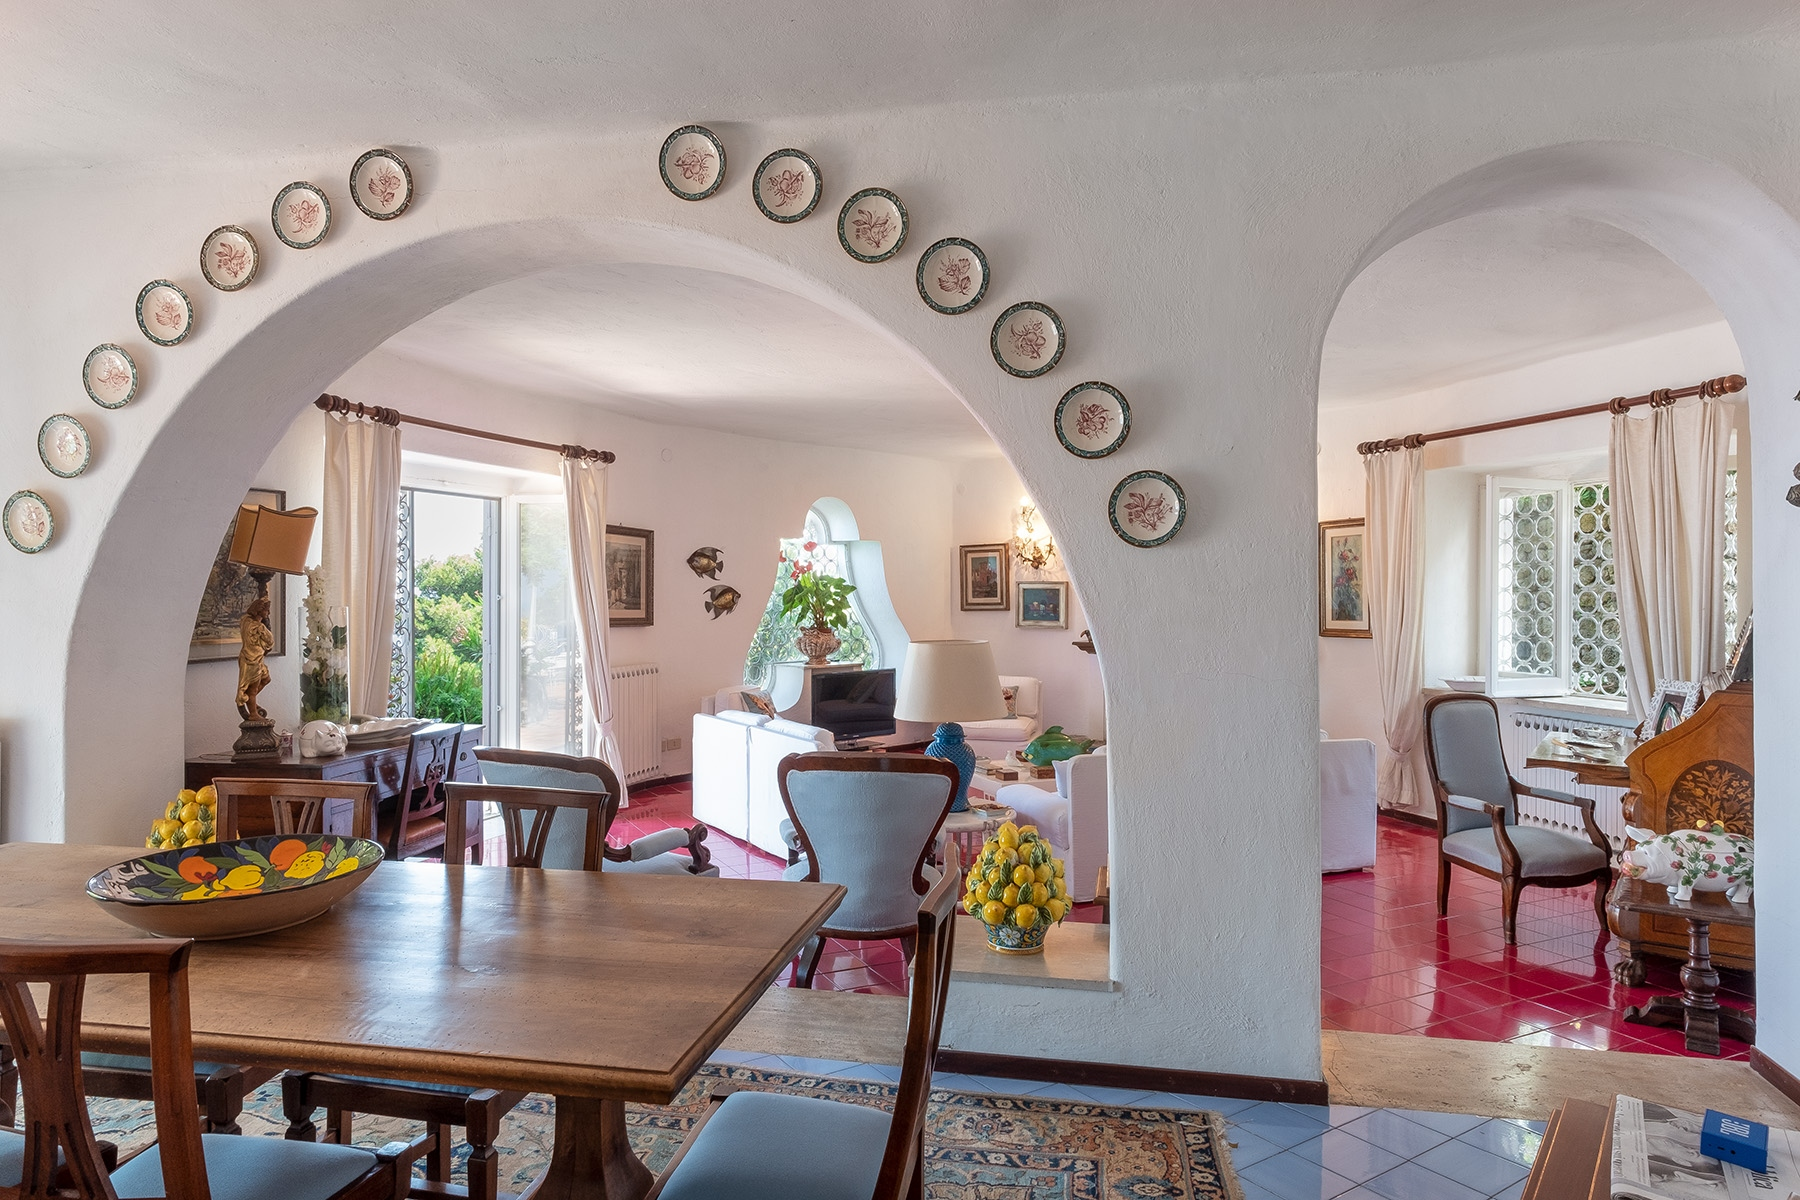 Villa in Vendita a Ischia: 5 locali, 206 mq - Foto 5